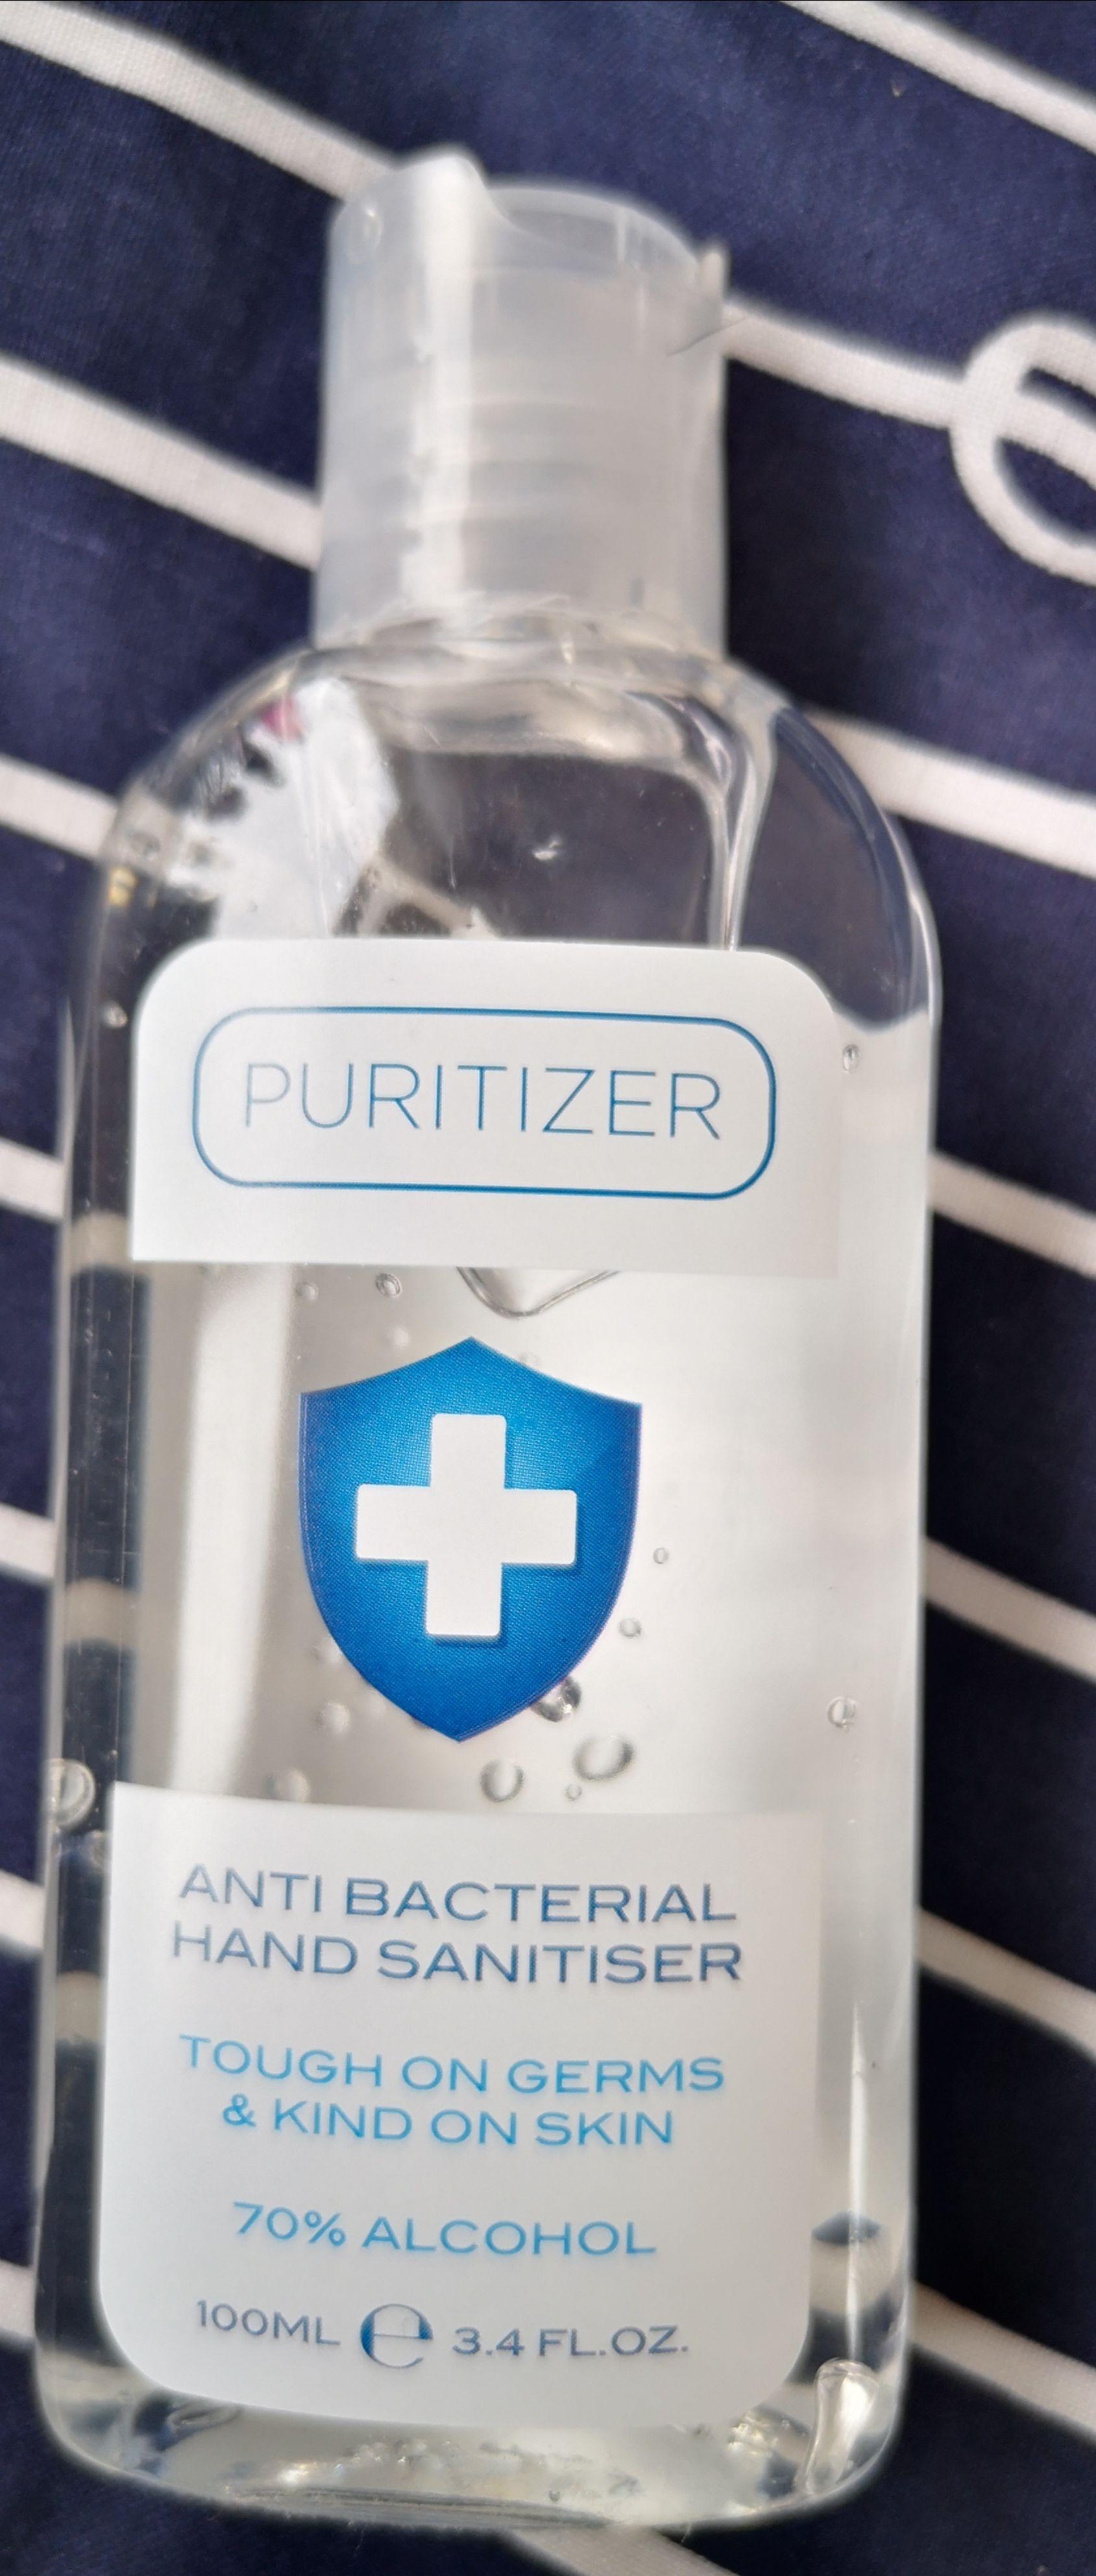 Puritizer Anti Bacterial Hand Sanitiser 100ml - £0.99 @ Aldi (Glasgow)